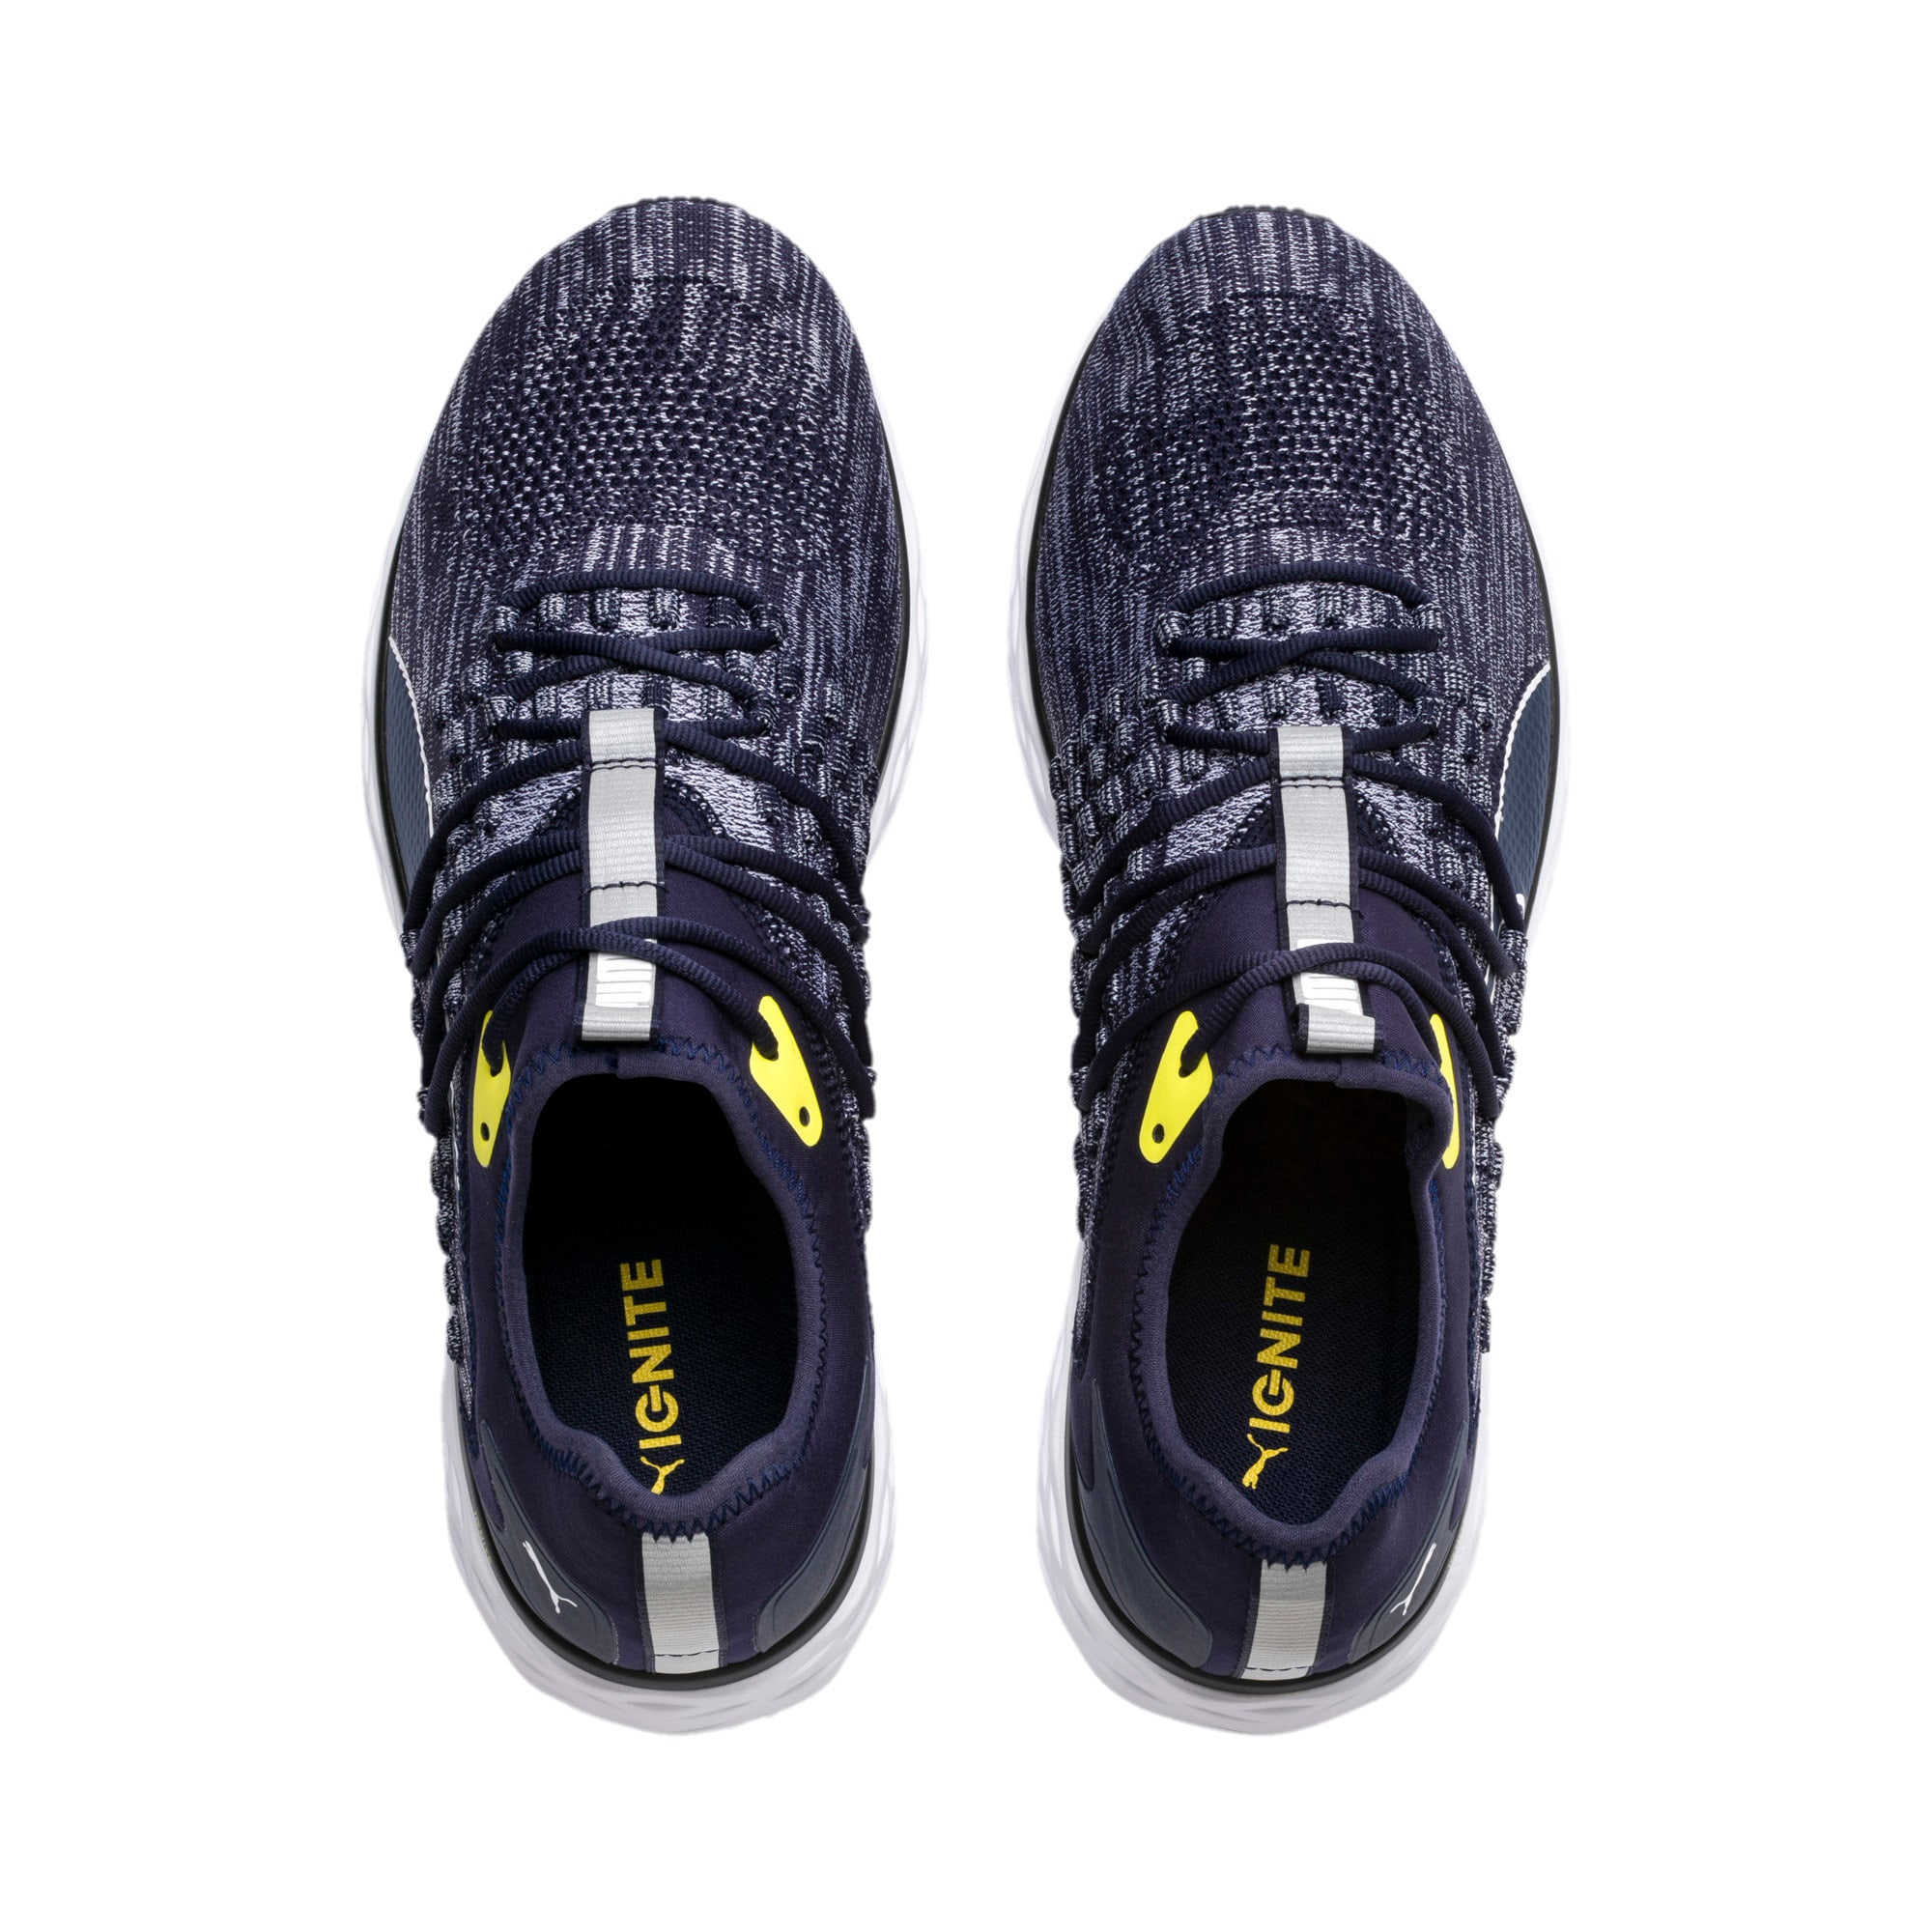 Thumbnail 7 of SPEED FUSEFIT Men's Running Shoes, Peacoat-White-Blazing Yellow, medium-IND